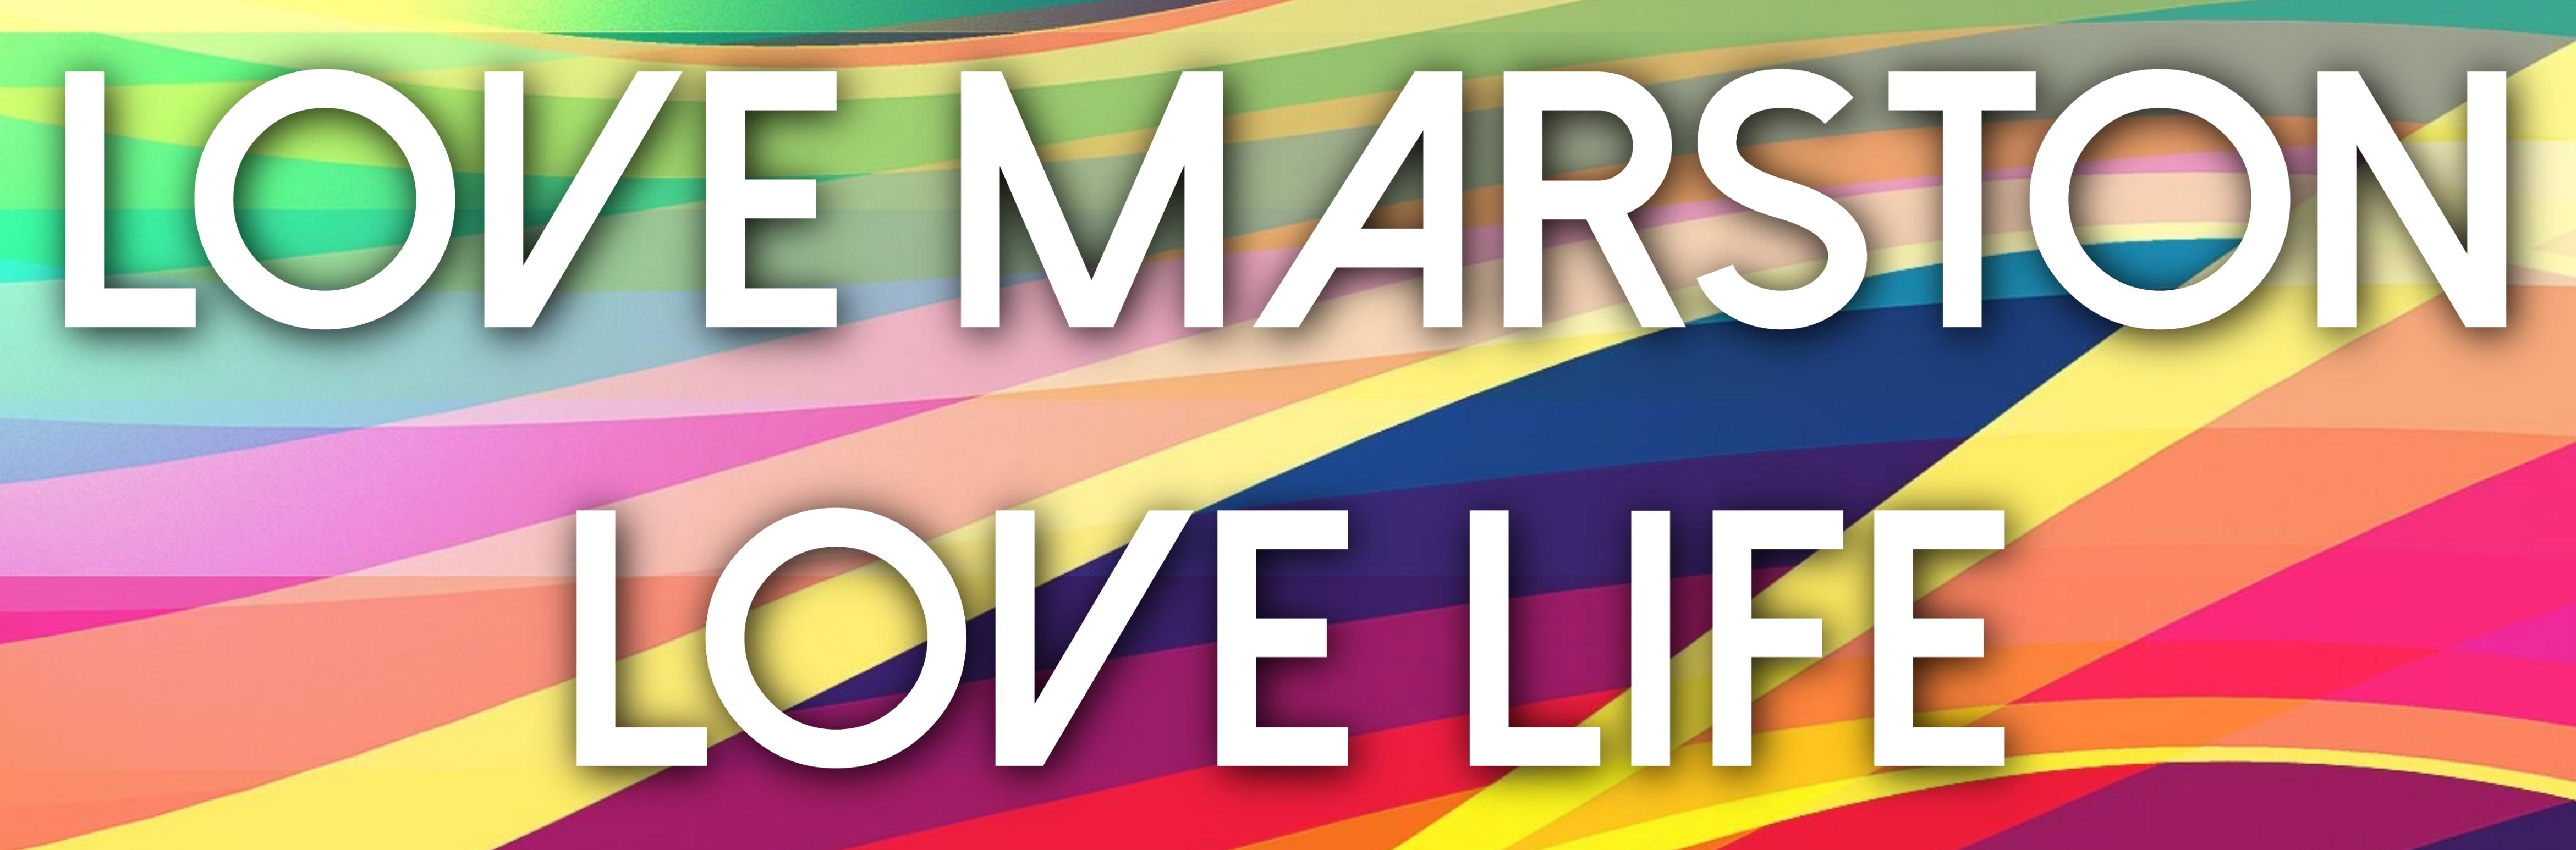 Love Marston Love Life